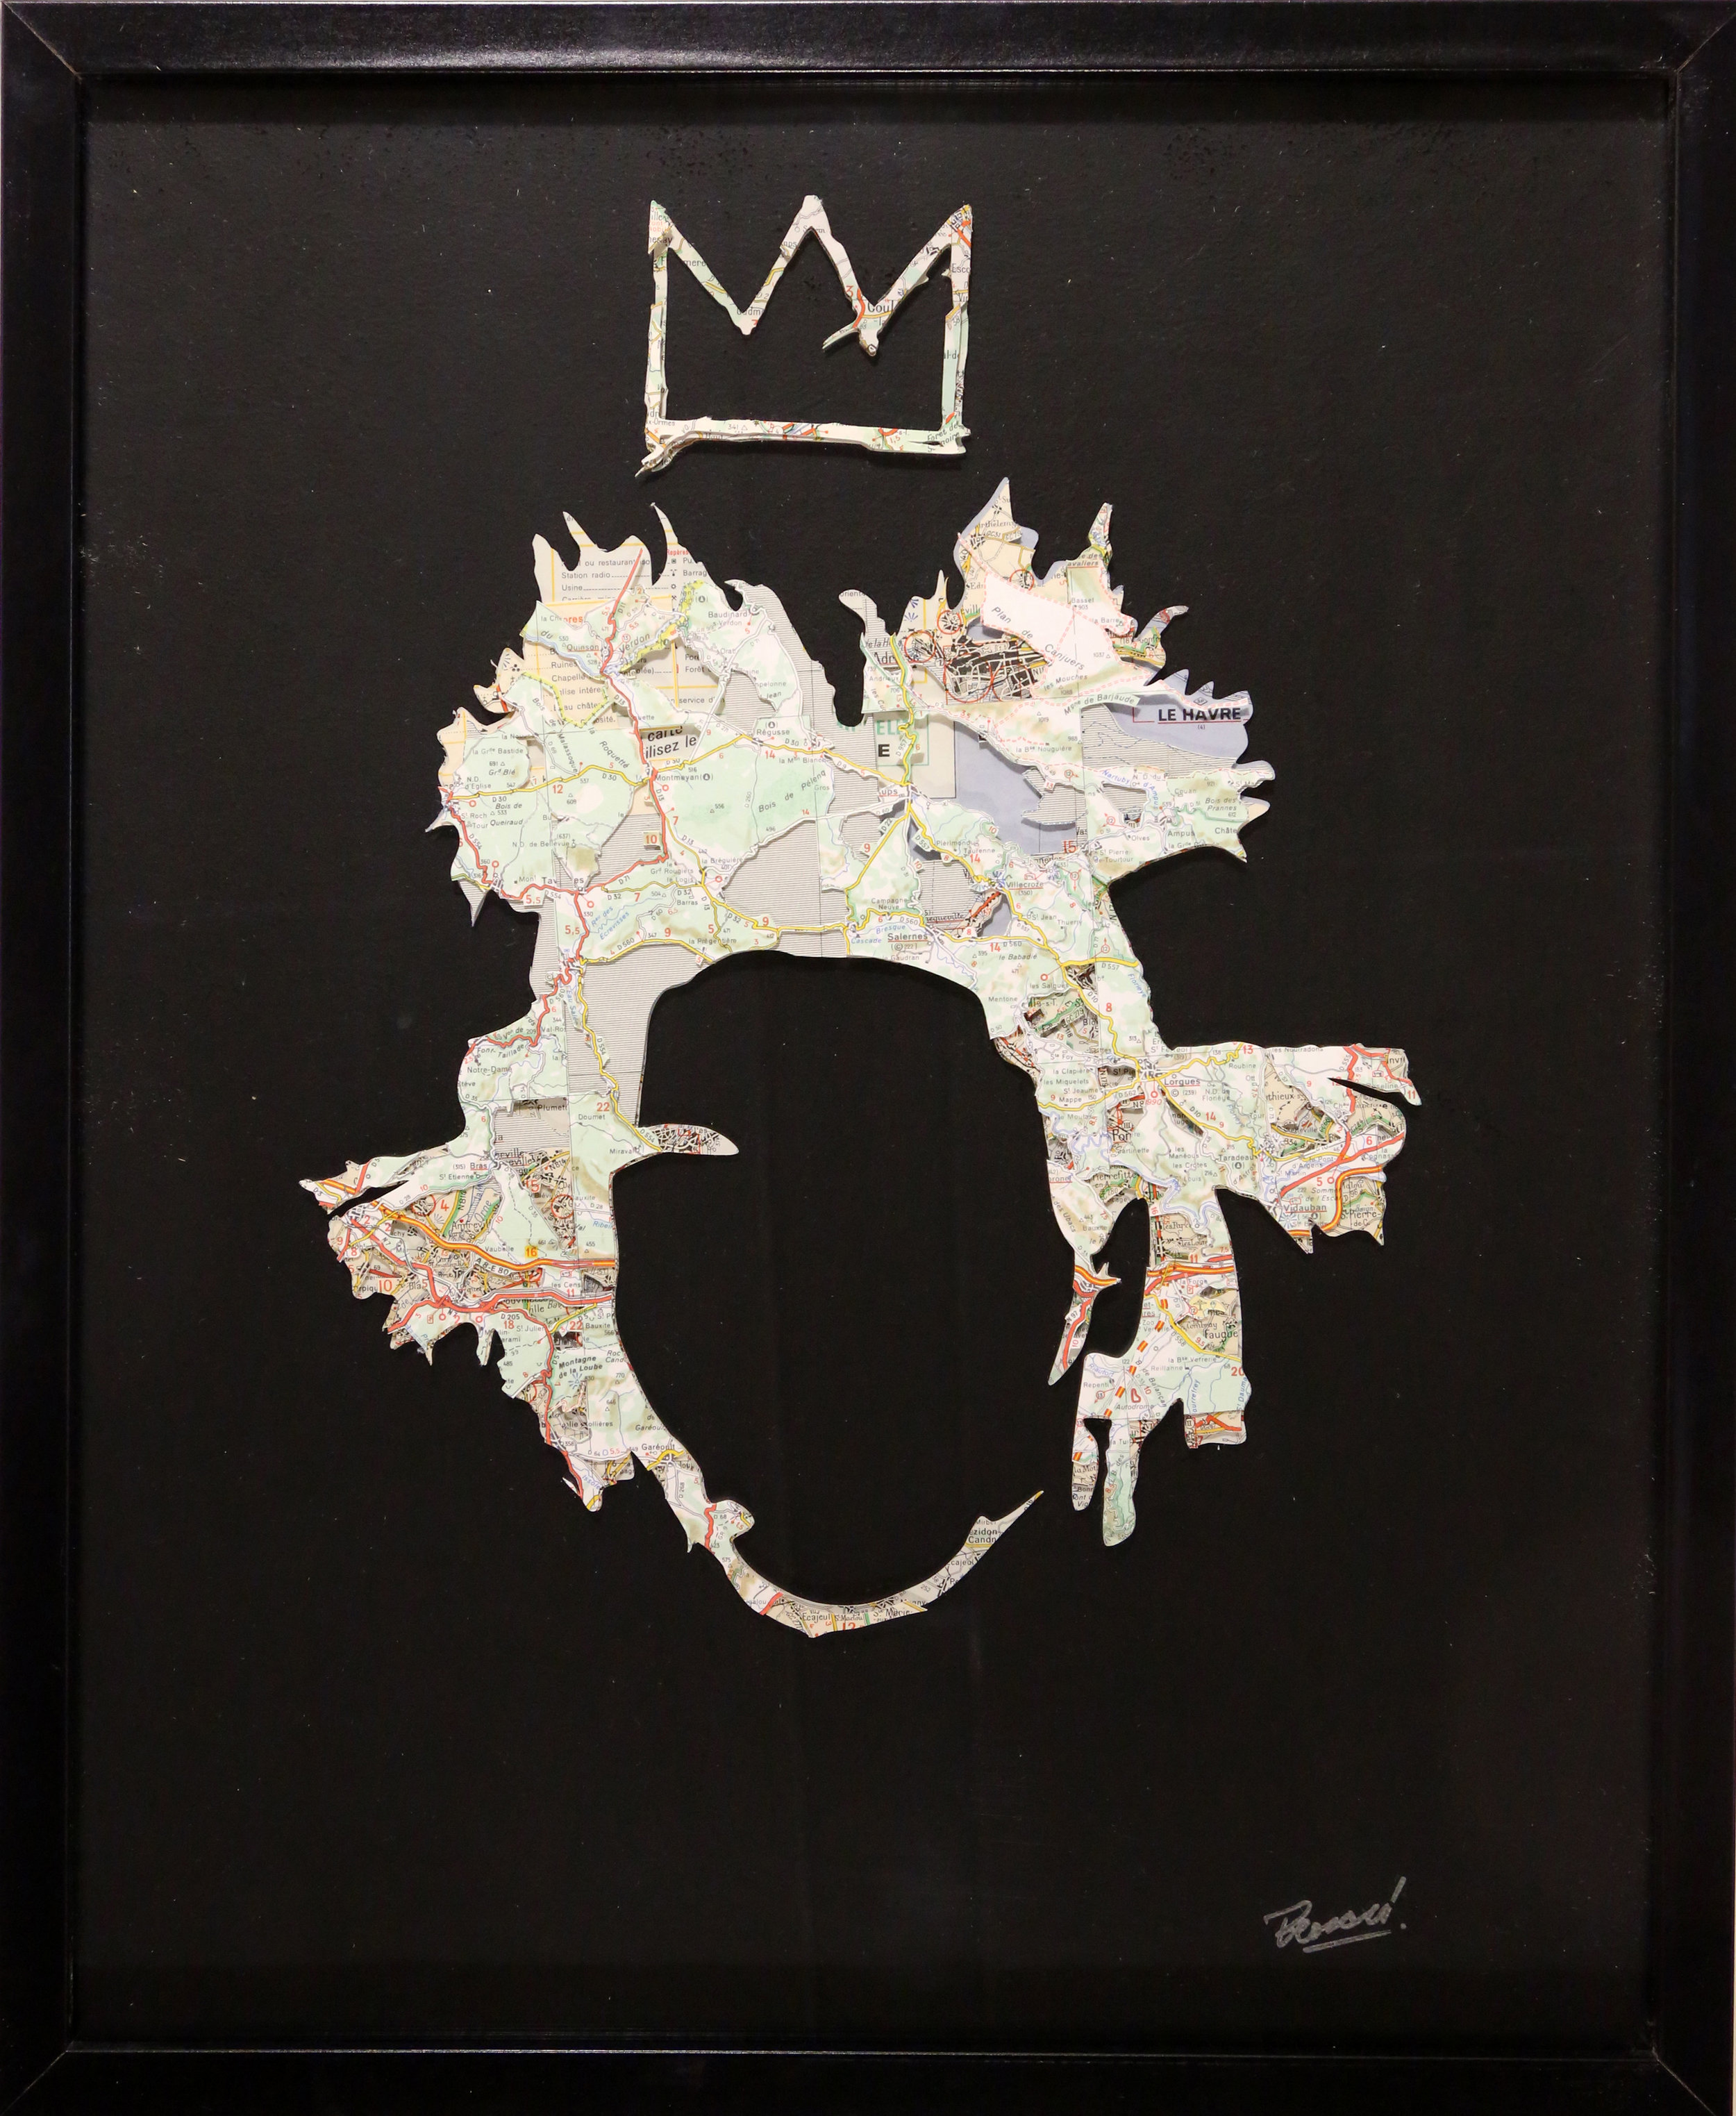 GalleryOonH-Joanathan Bessaci-Basquiat 1-2017-Michelin maps and glass-16x20-1400.jpg